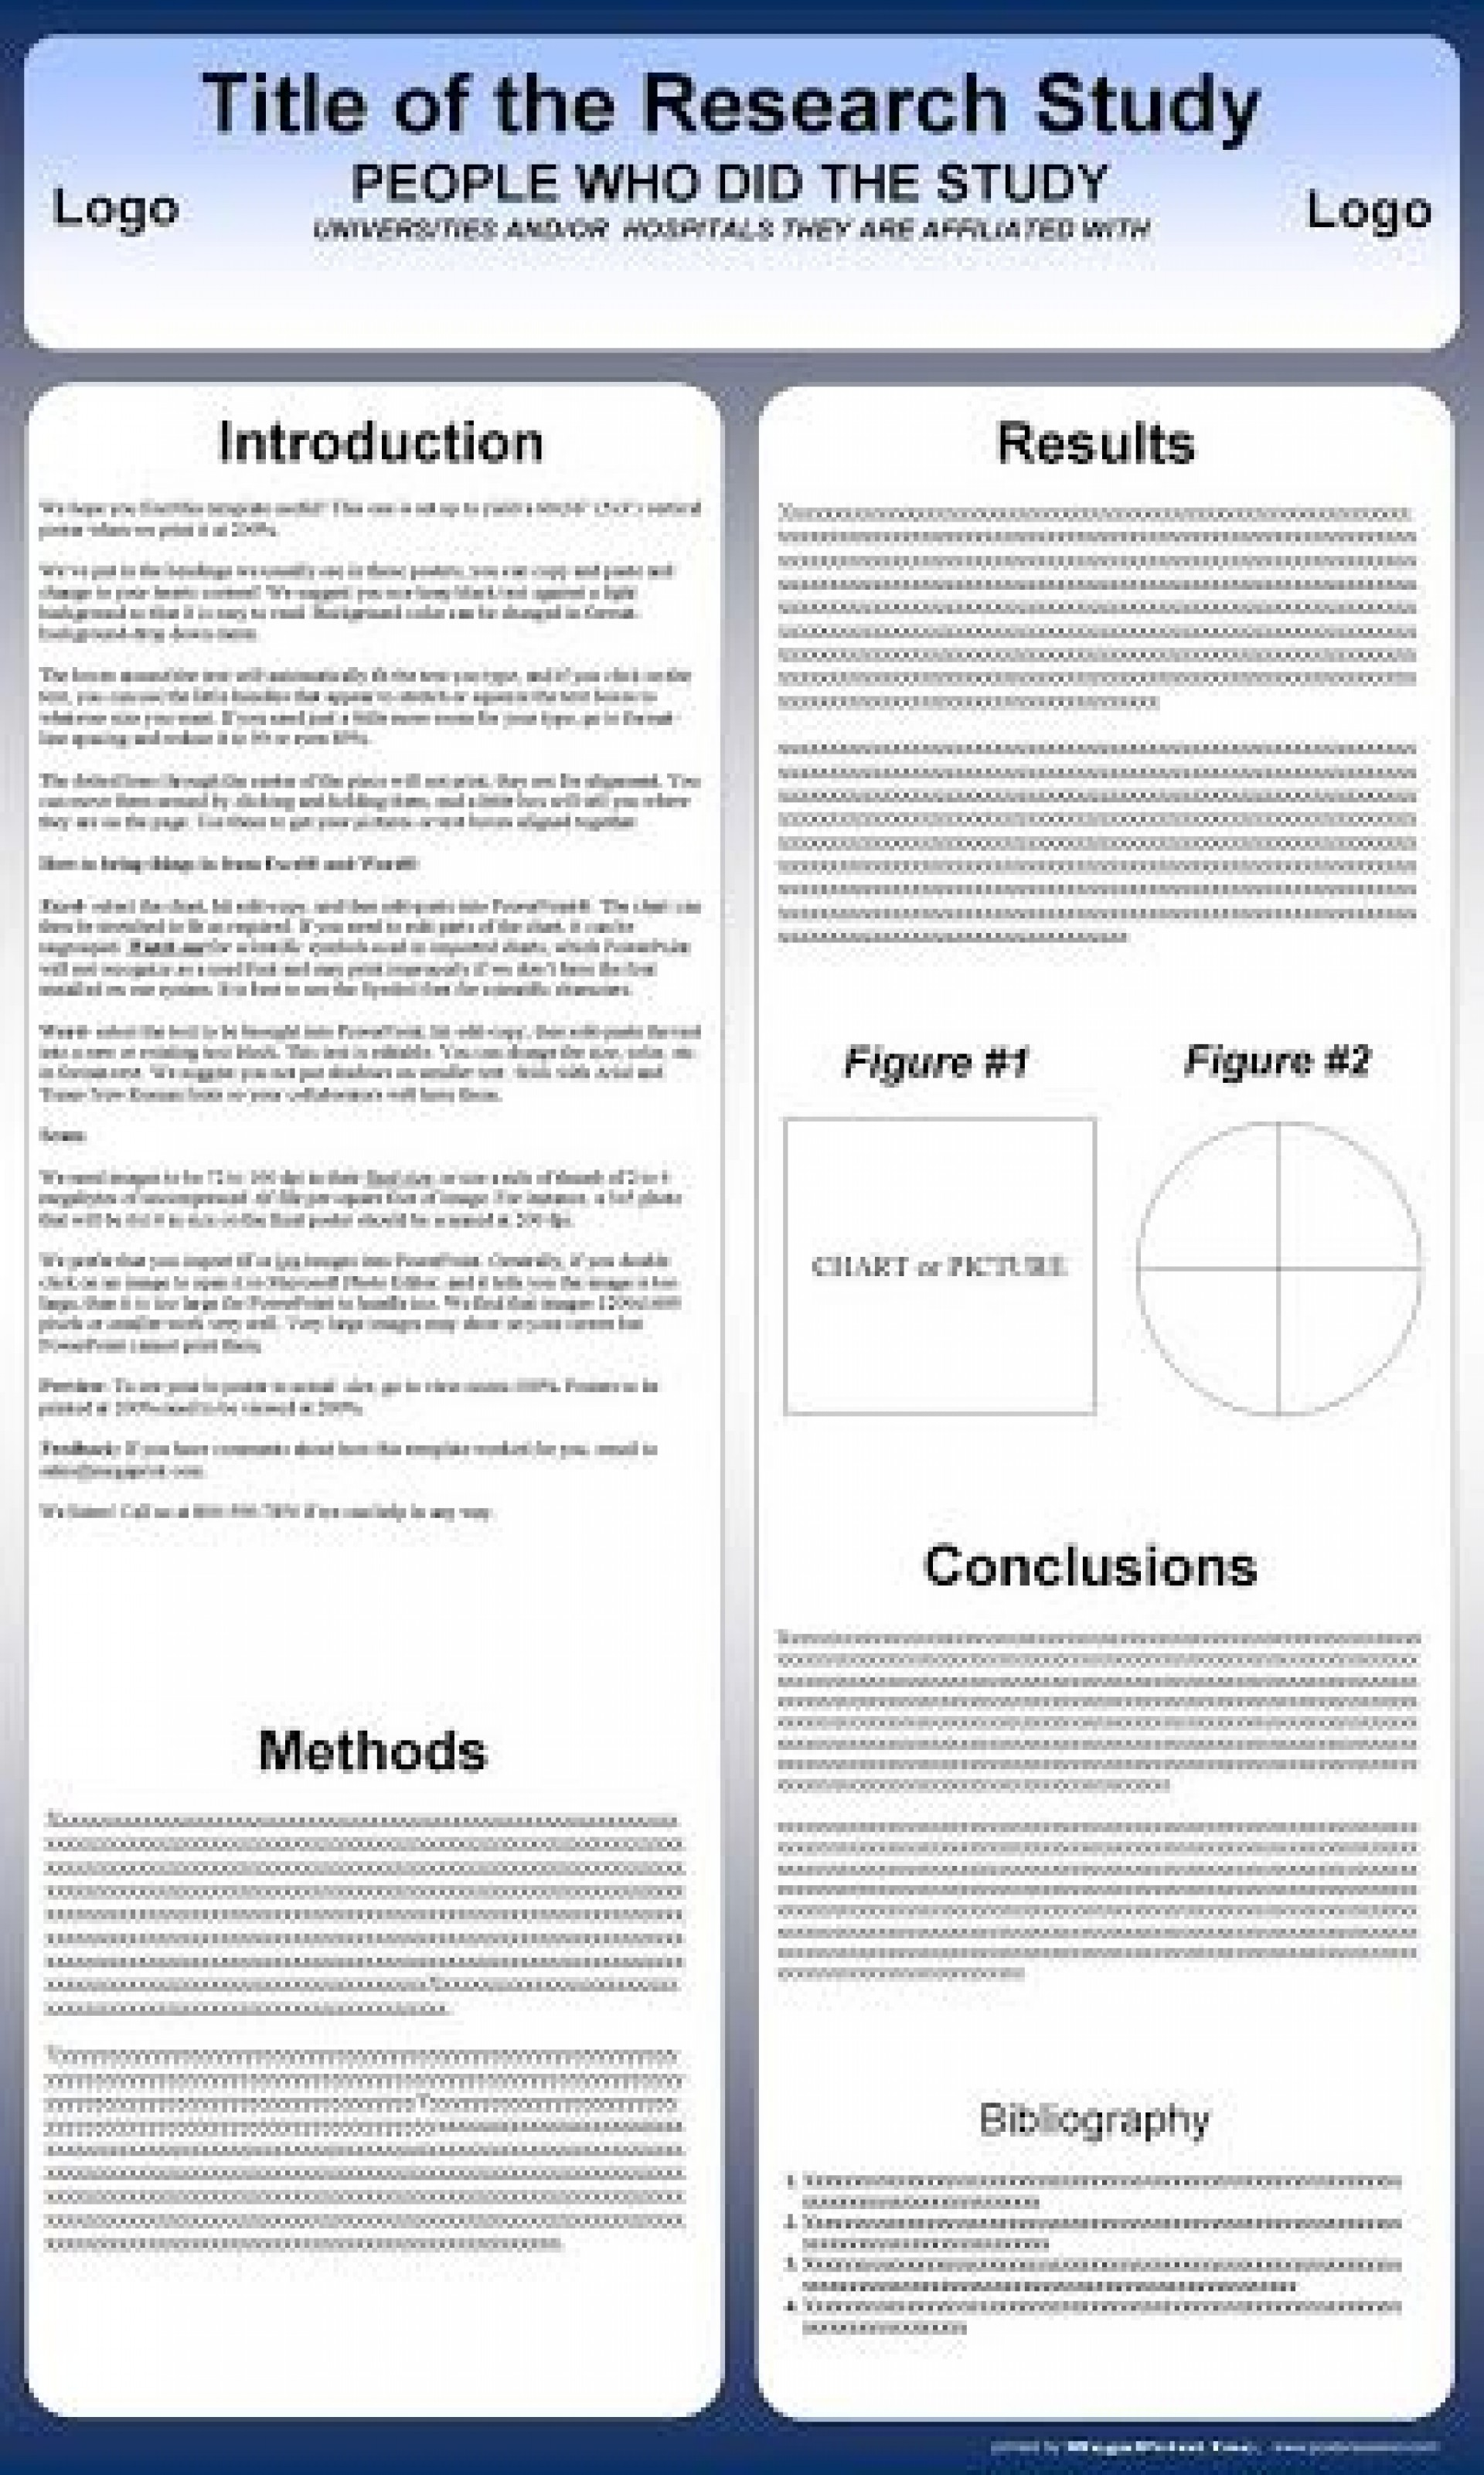 009 Impressive Scientific Poster Design Template Free Download Example 1920